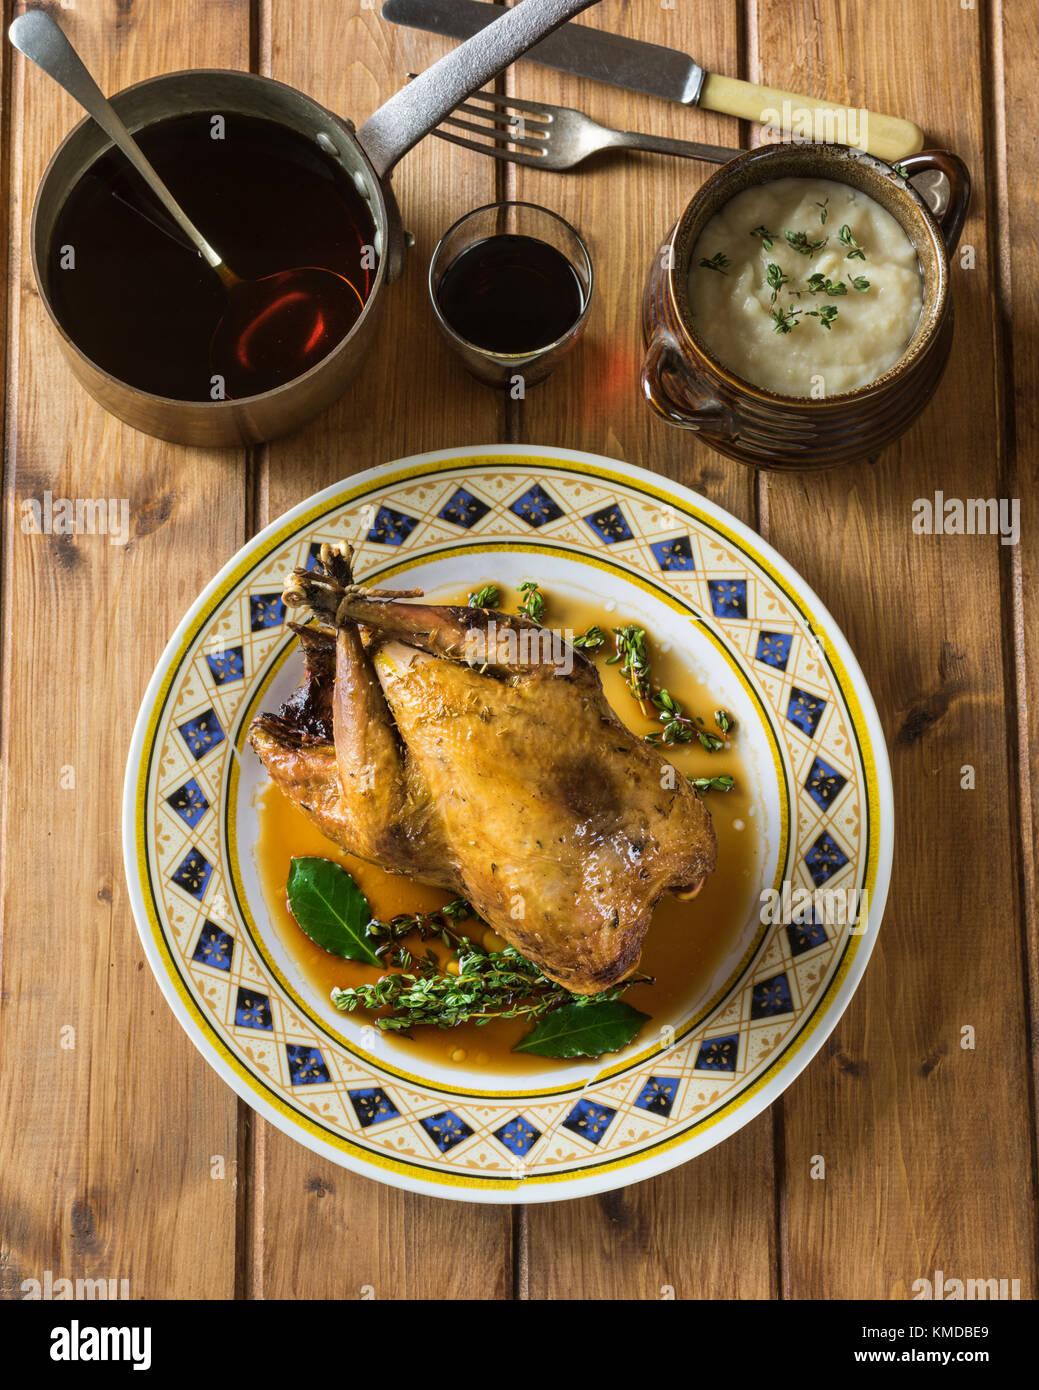 Roast pheasant - Stock Image